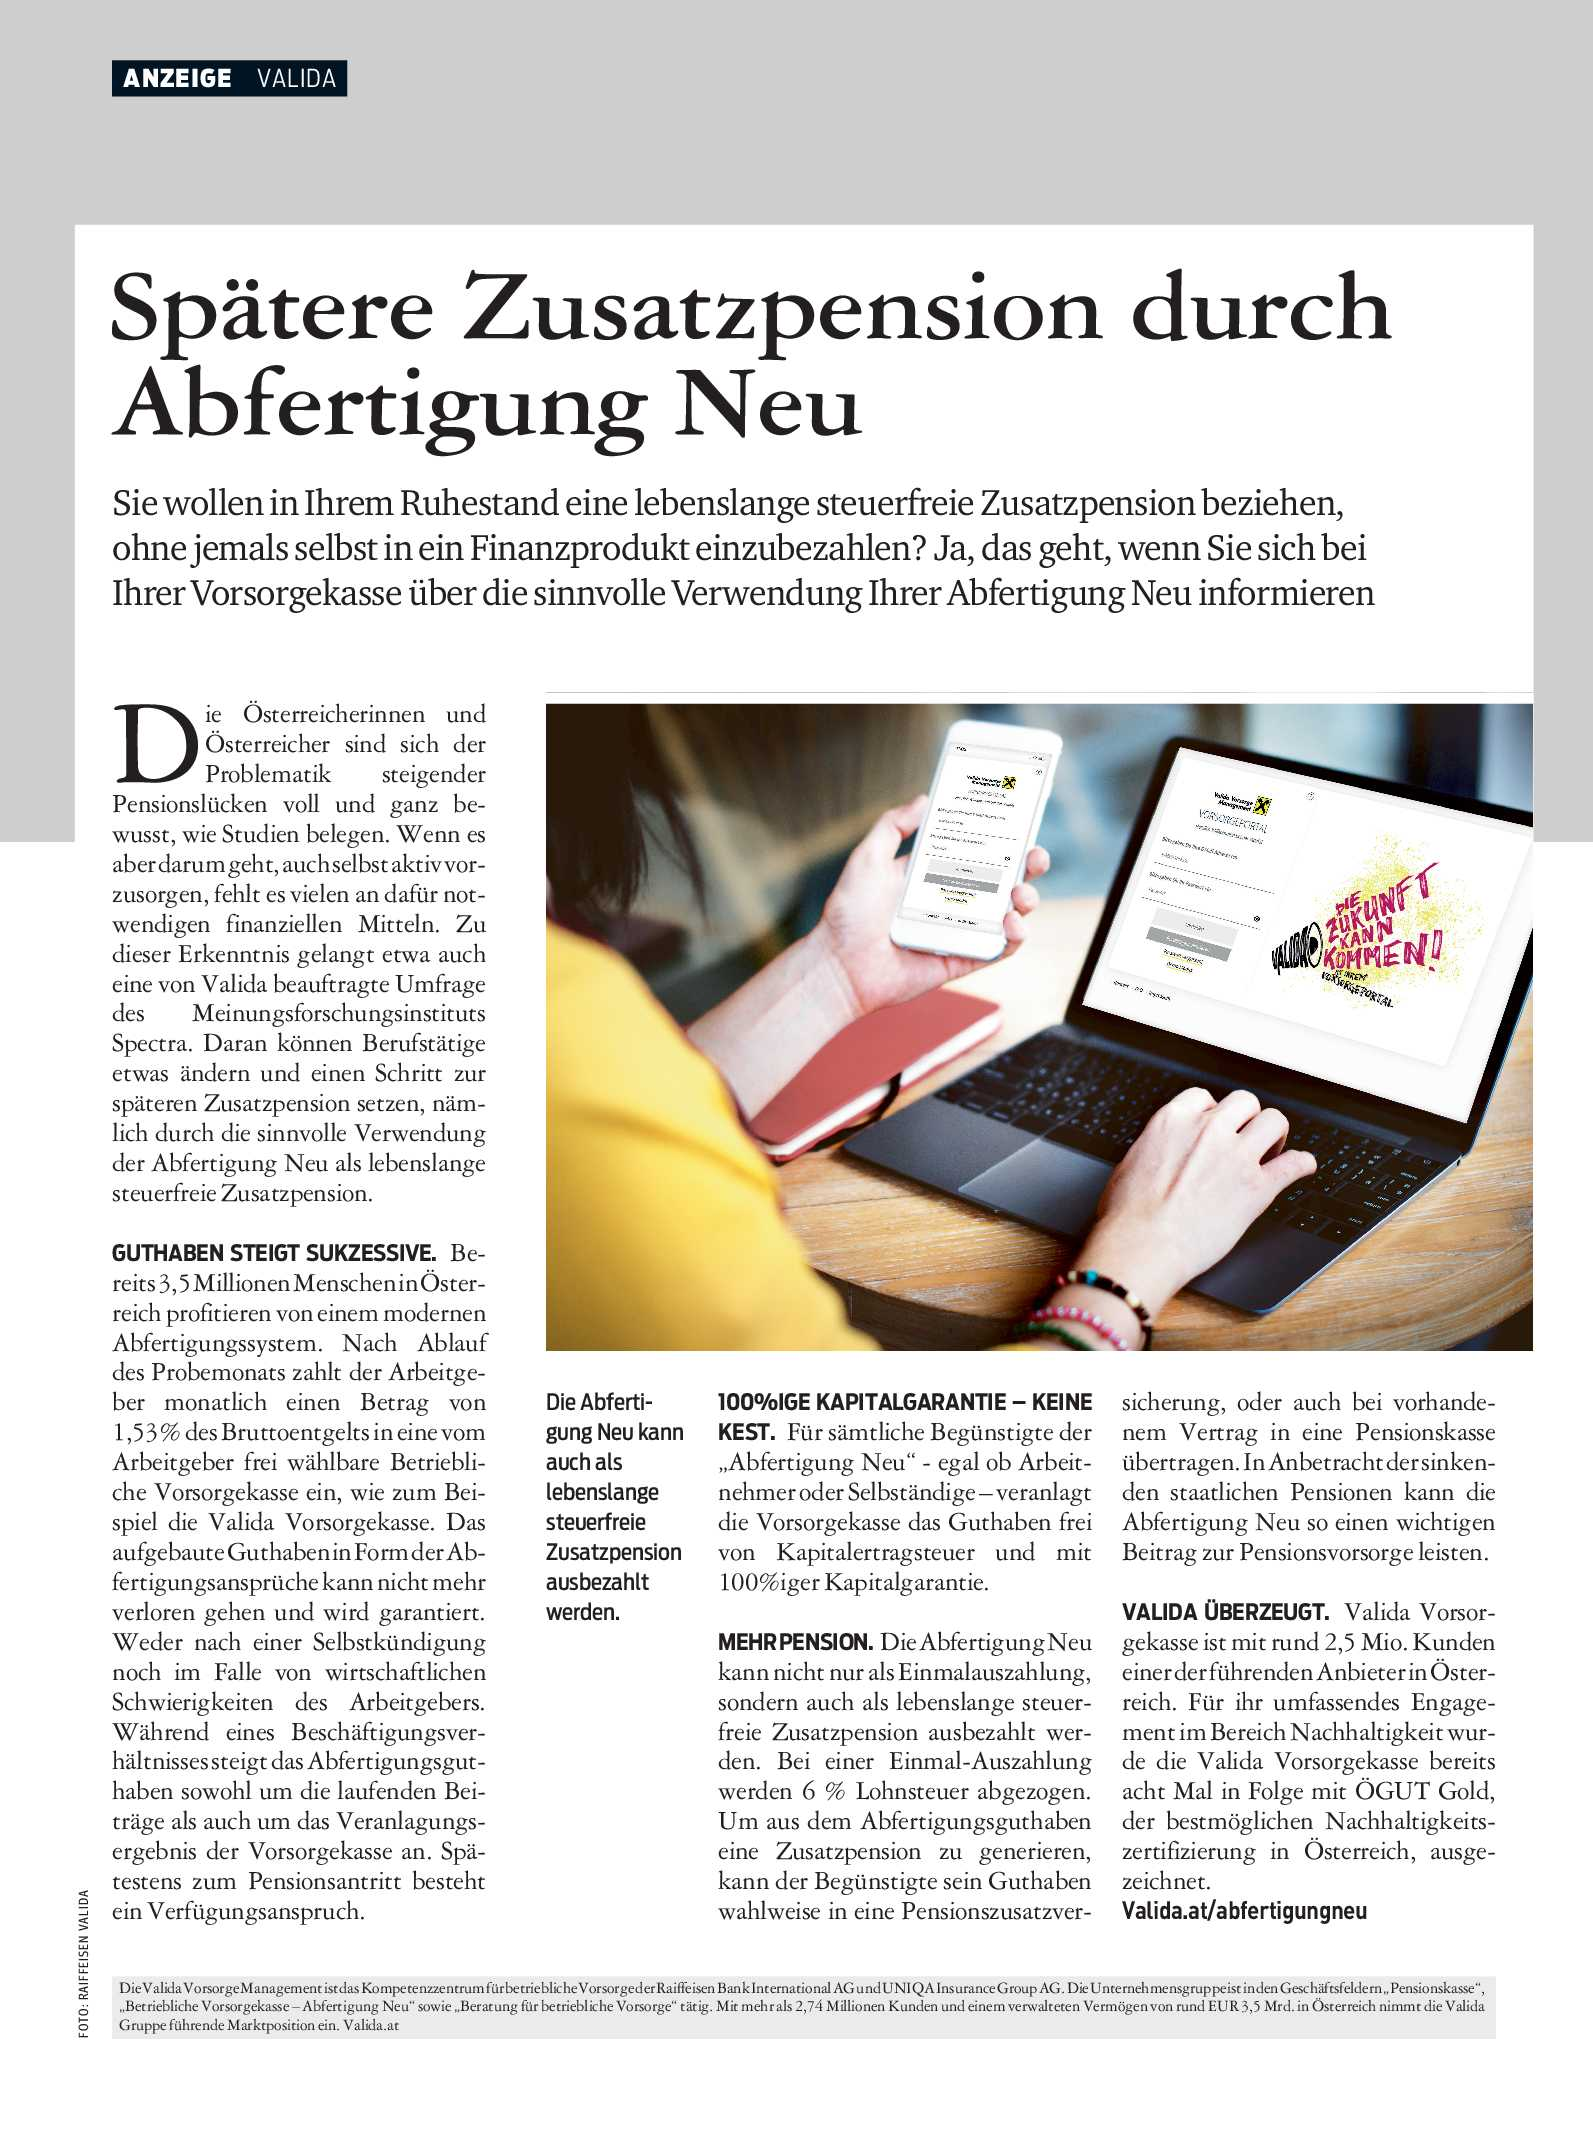 public/epaper/imported/20201118/kurier/magazin/magazin_20201118_026.jpg